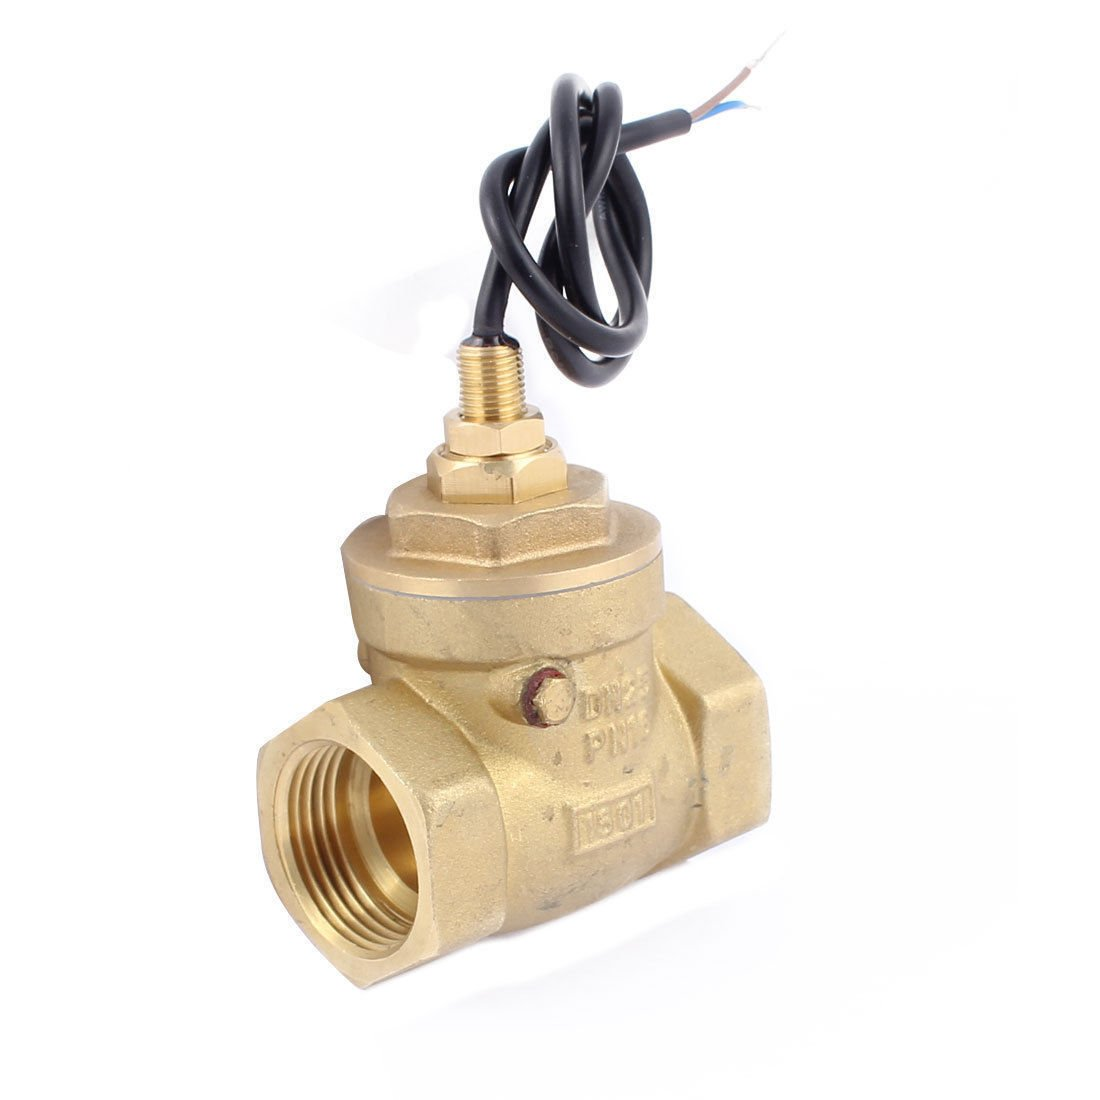 "G1"" Female Thread Water Flow Sensor Switch Flowmeter Meter 8-50L/min SEN-DB25"